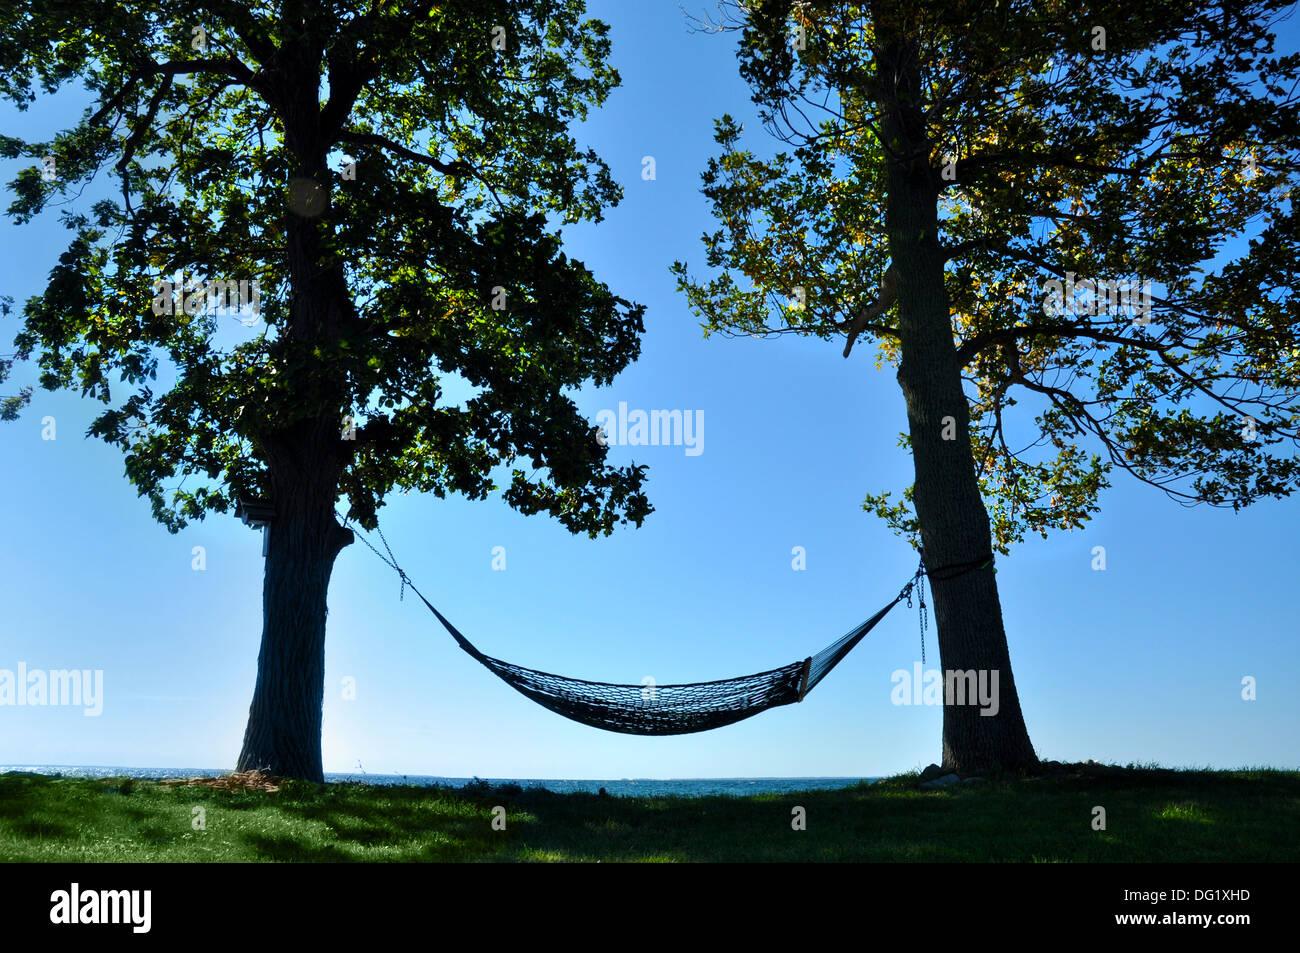 hammock between two trees on shoreline of lake ontario new york stock photo 61508425 alamy. Black Bedroom Furniture Sets. Home Design Ideas